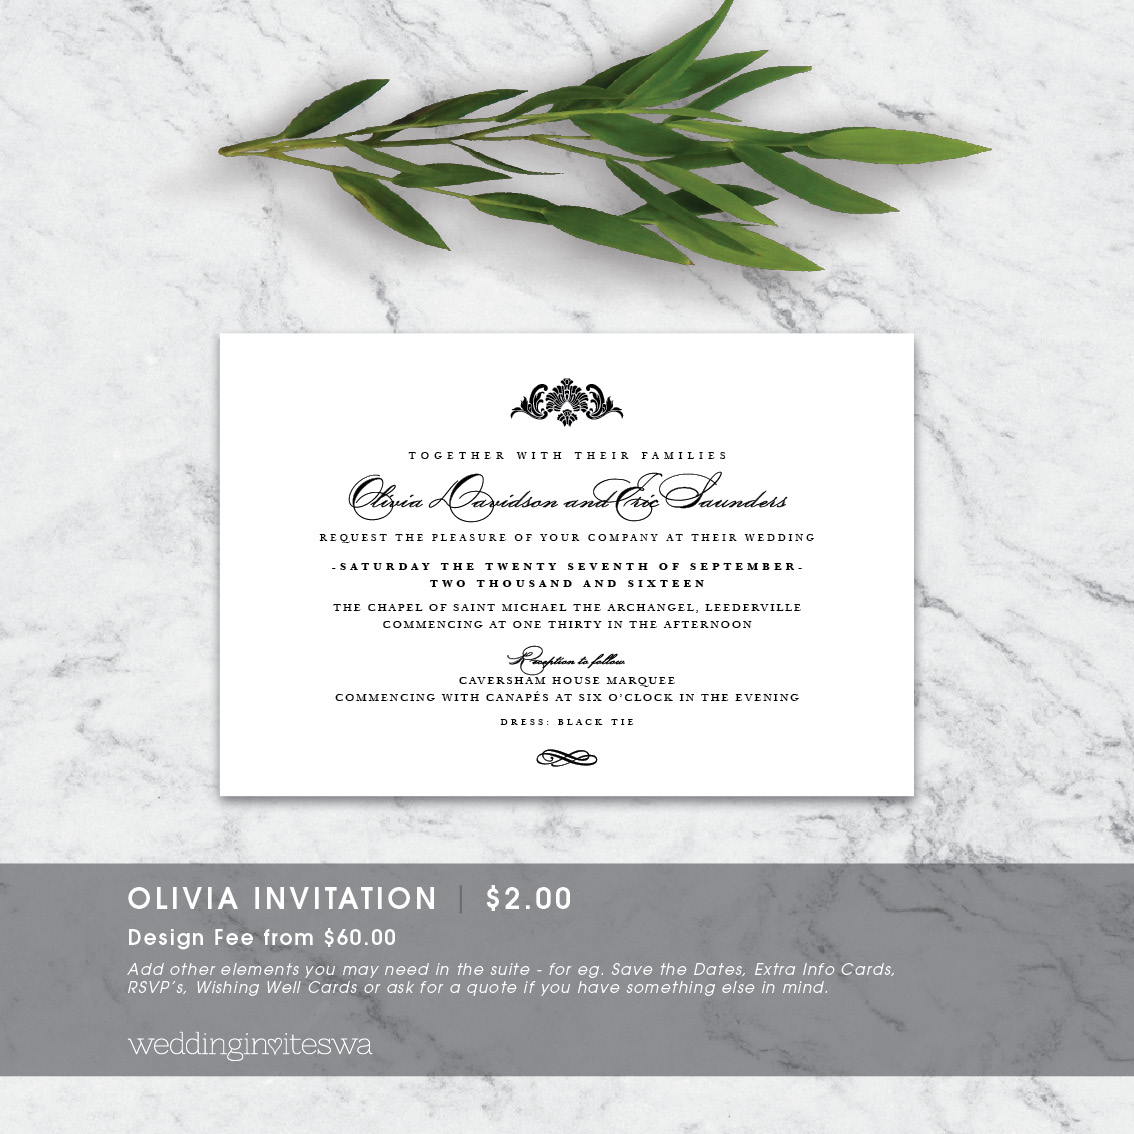 OLIVIA_invite